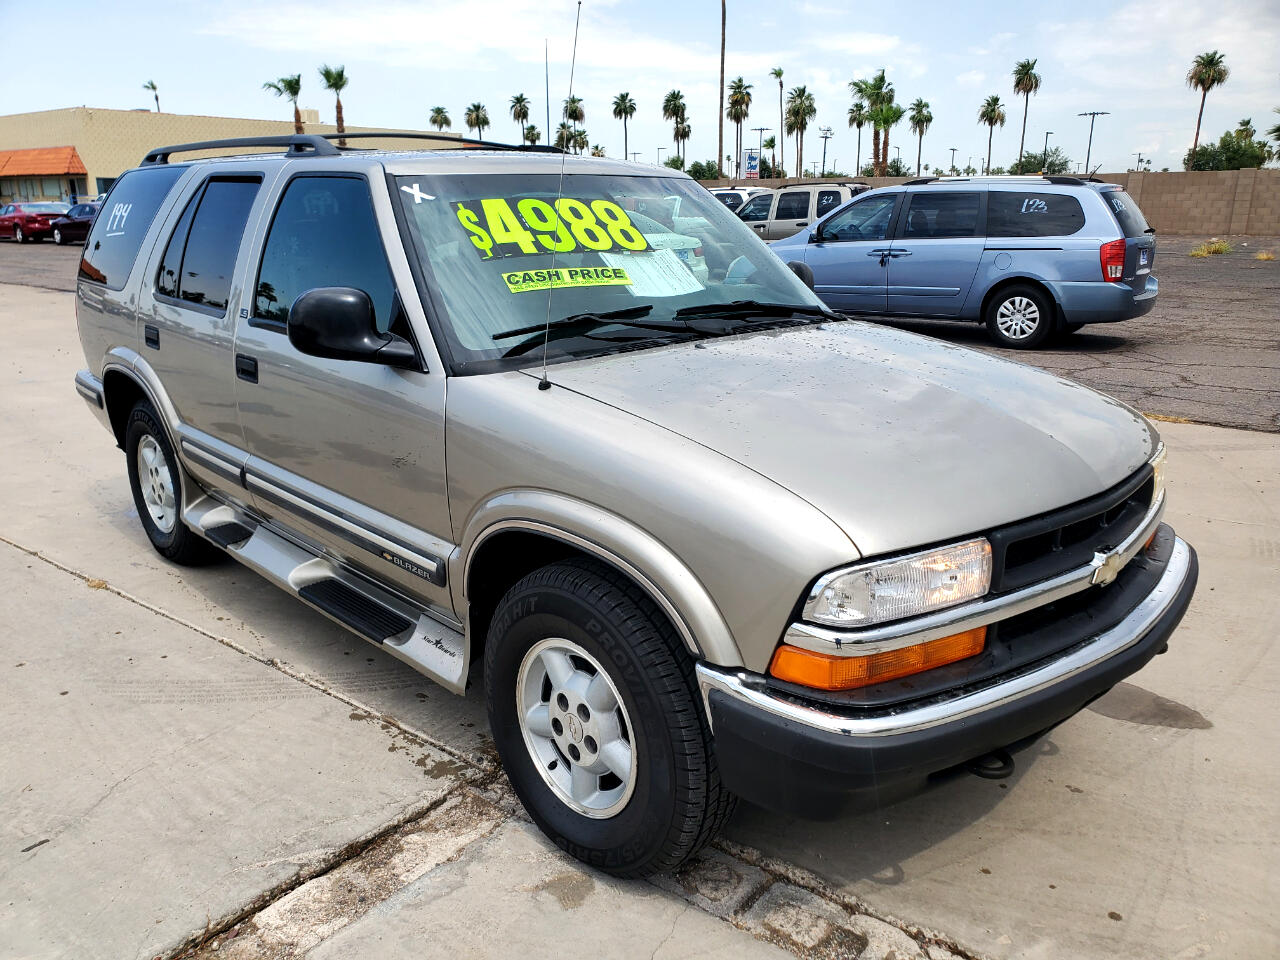 Chevrolet Blazer 4dr 4WD LS 1998